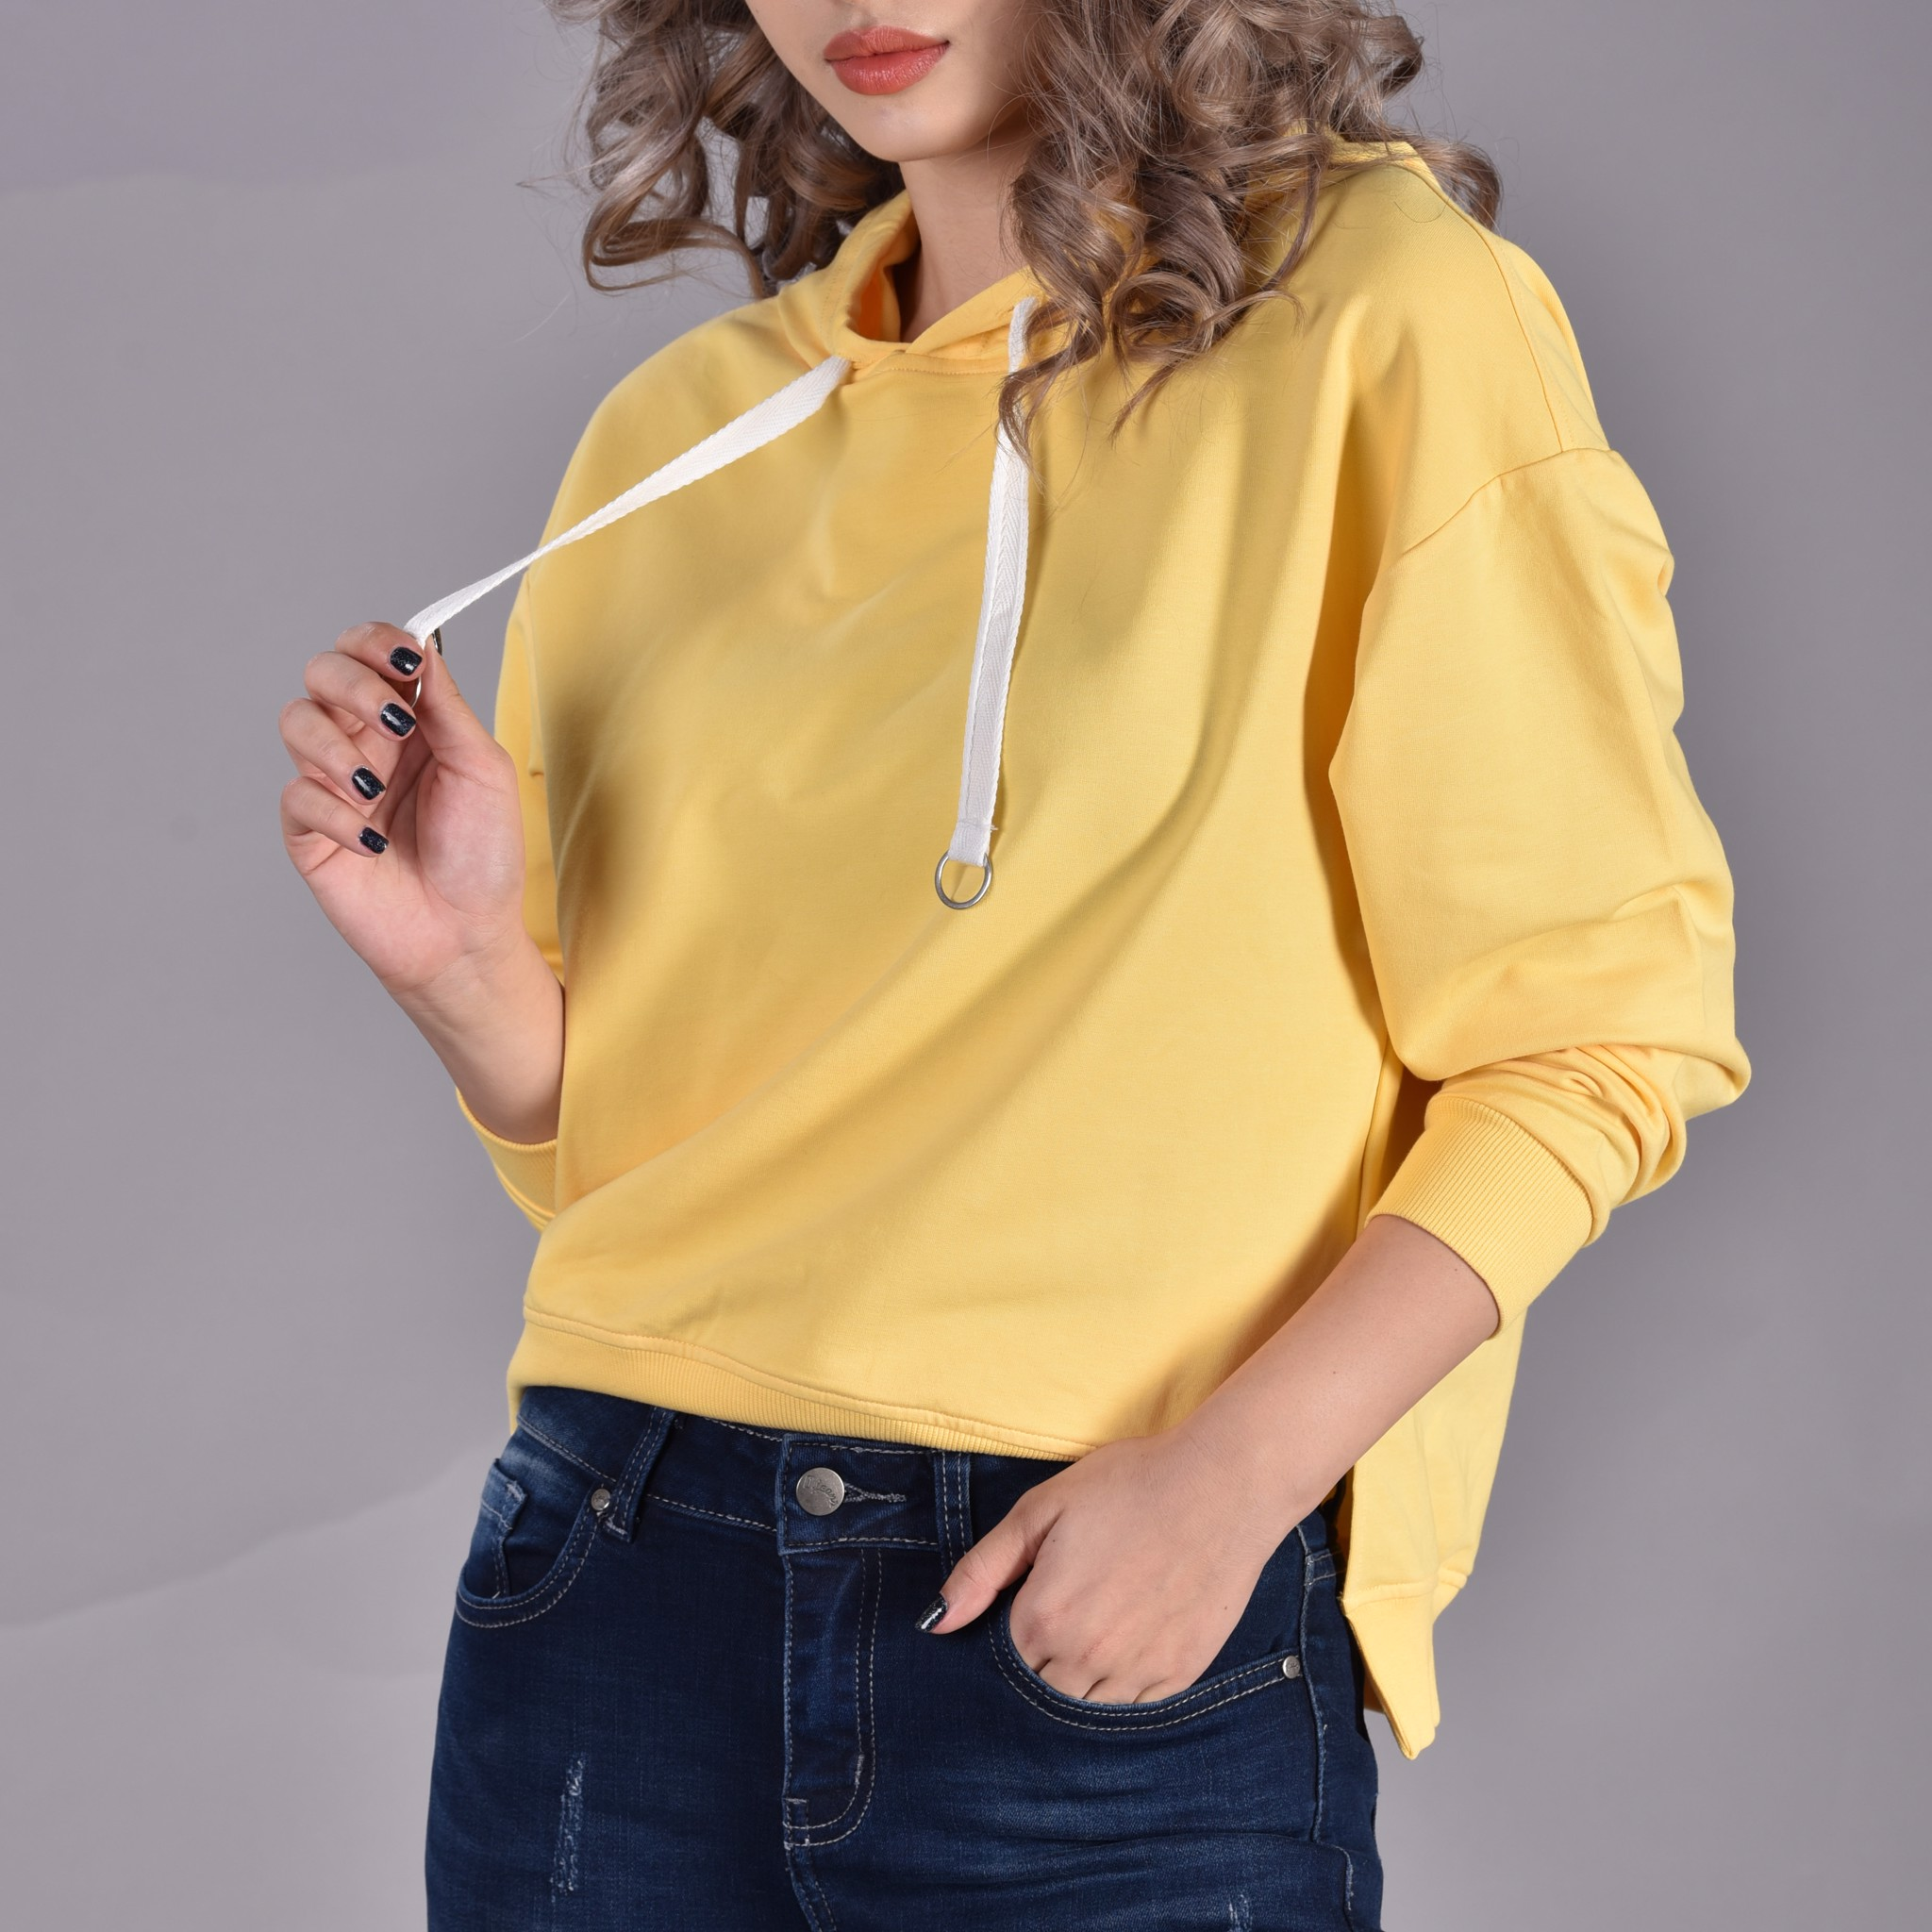 Áo Hoodie Chui Đầu Nữ O.jeans - 5AHS840776FW